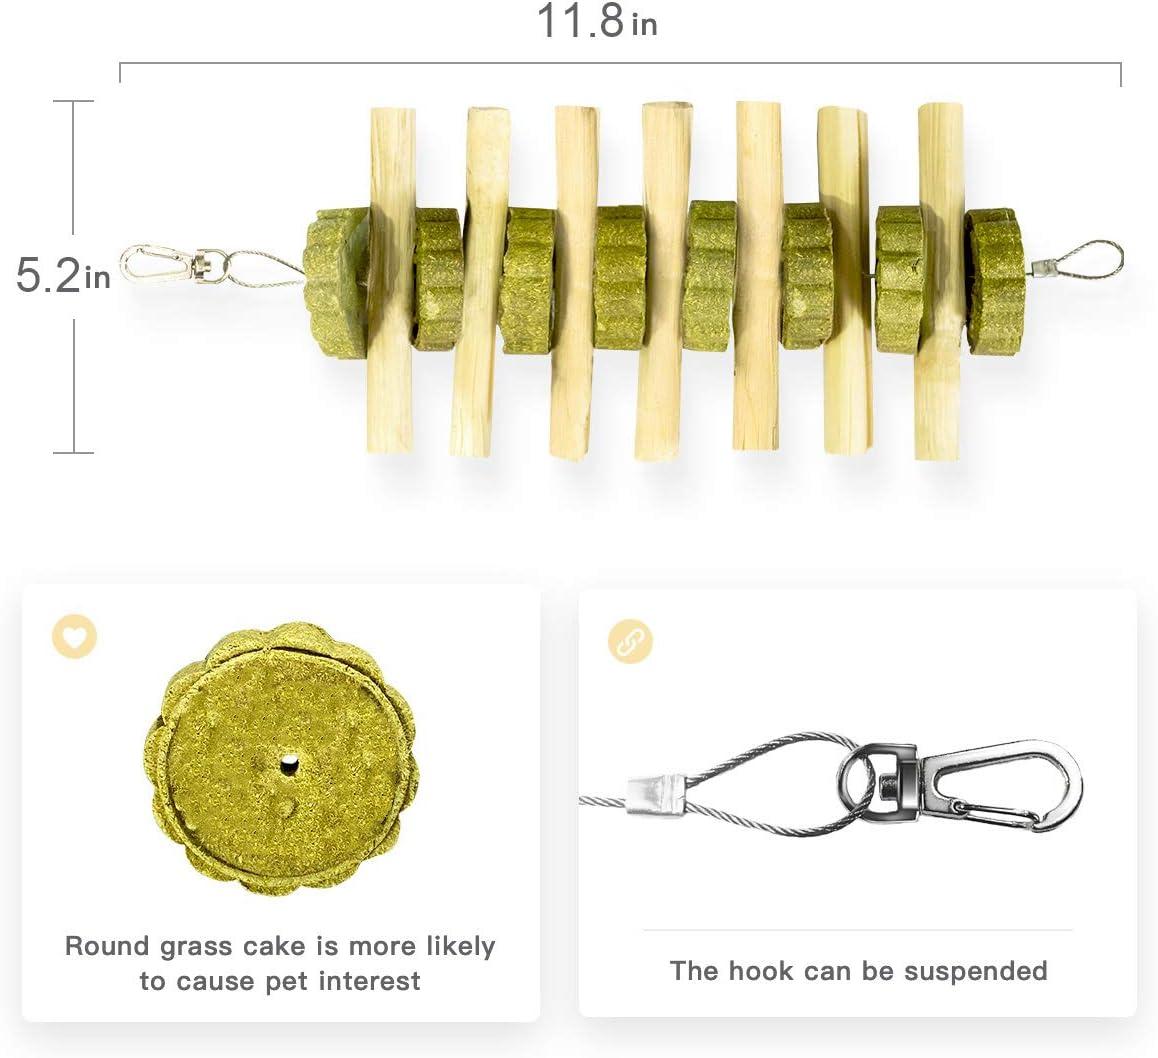 Keys Fitness 5600T Treadmill Motor Brush Part Numbers 12-0057 and 412-00008